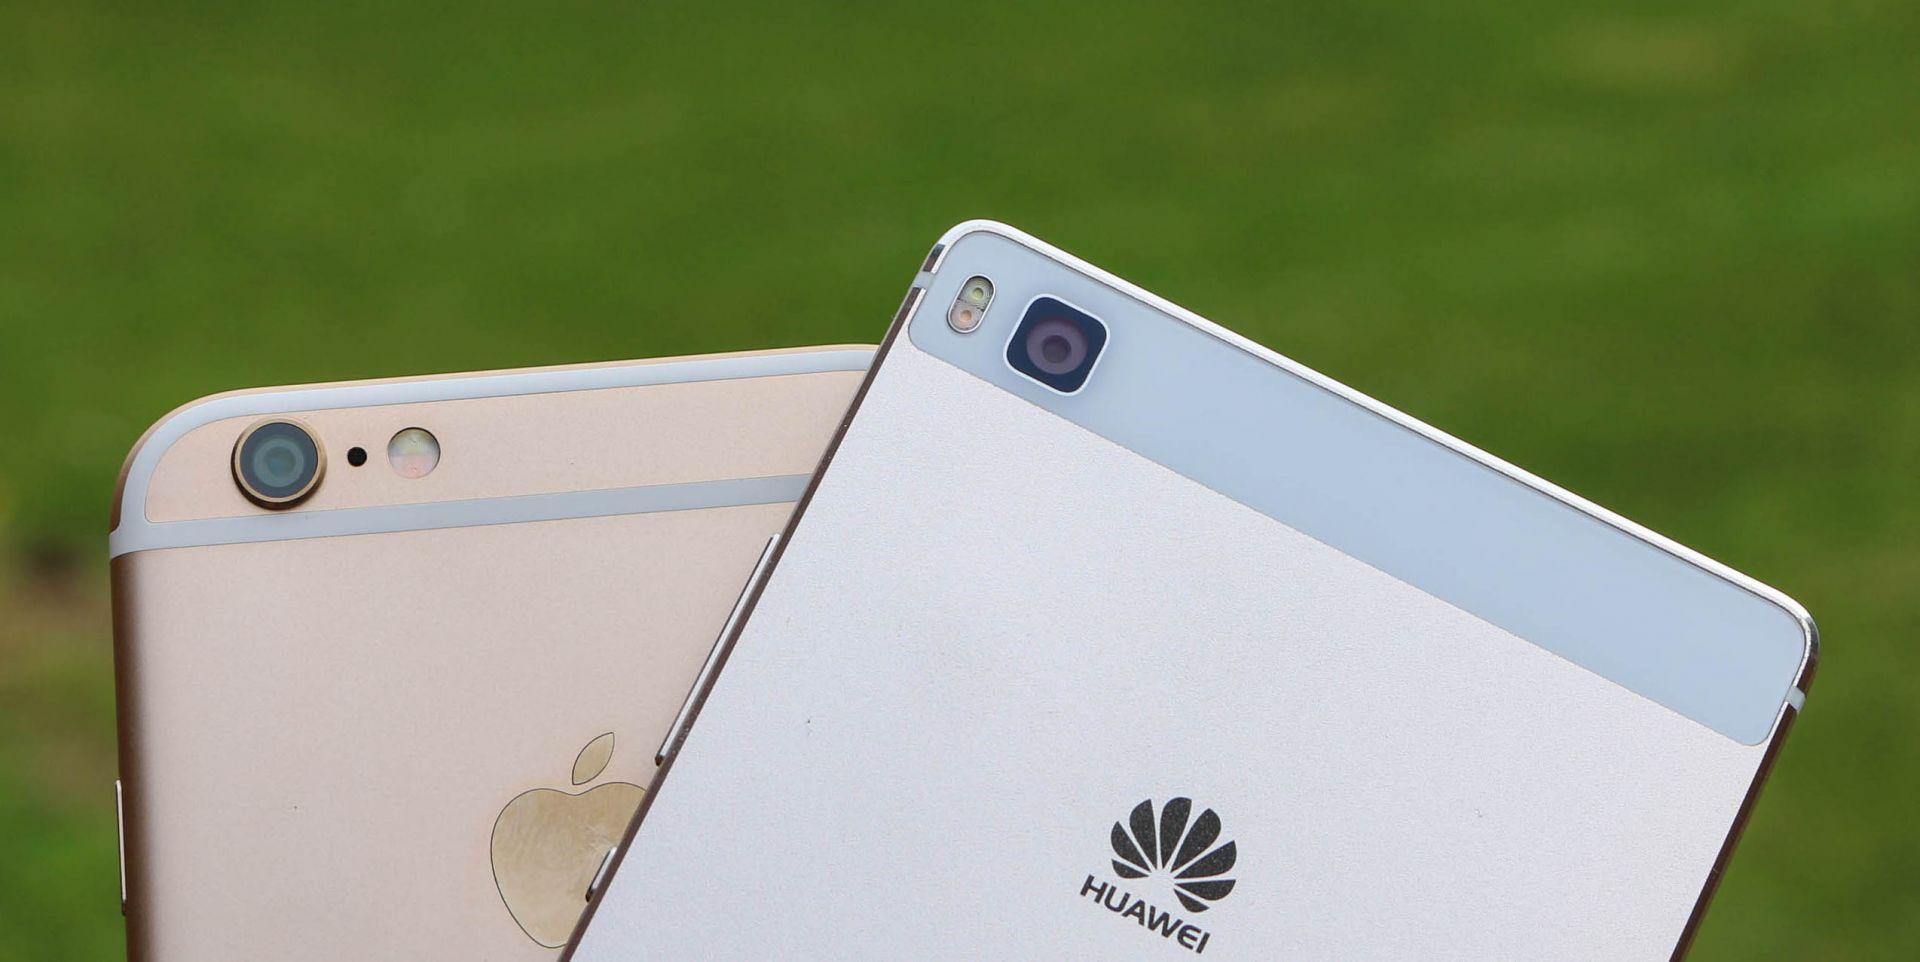 Китайские компании активно бойкотируют Apple